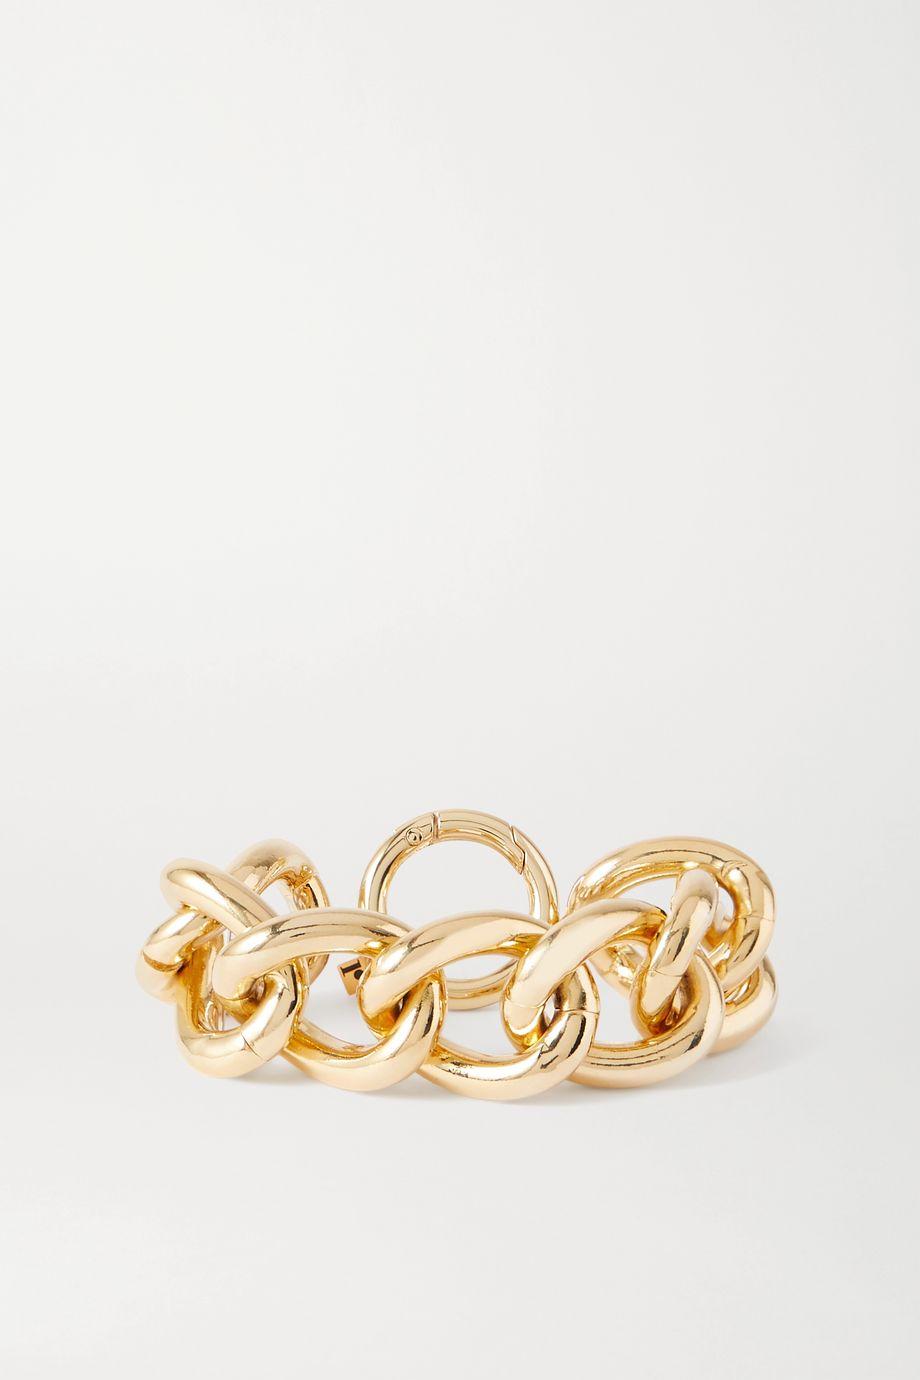 Rosantica Canasta 人造珍珠金色手链